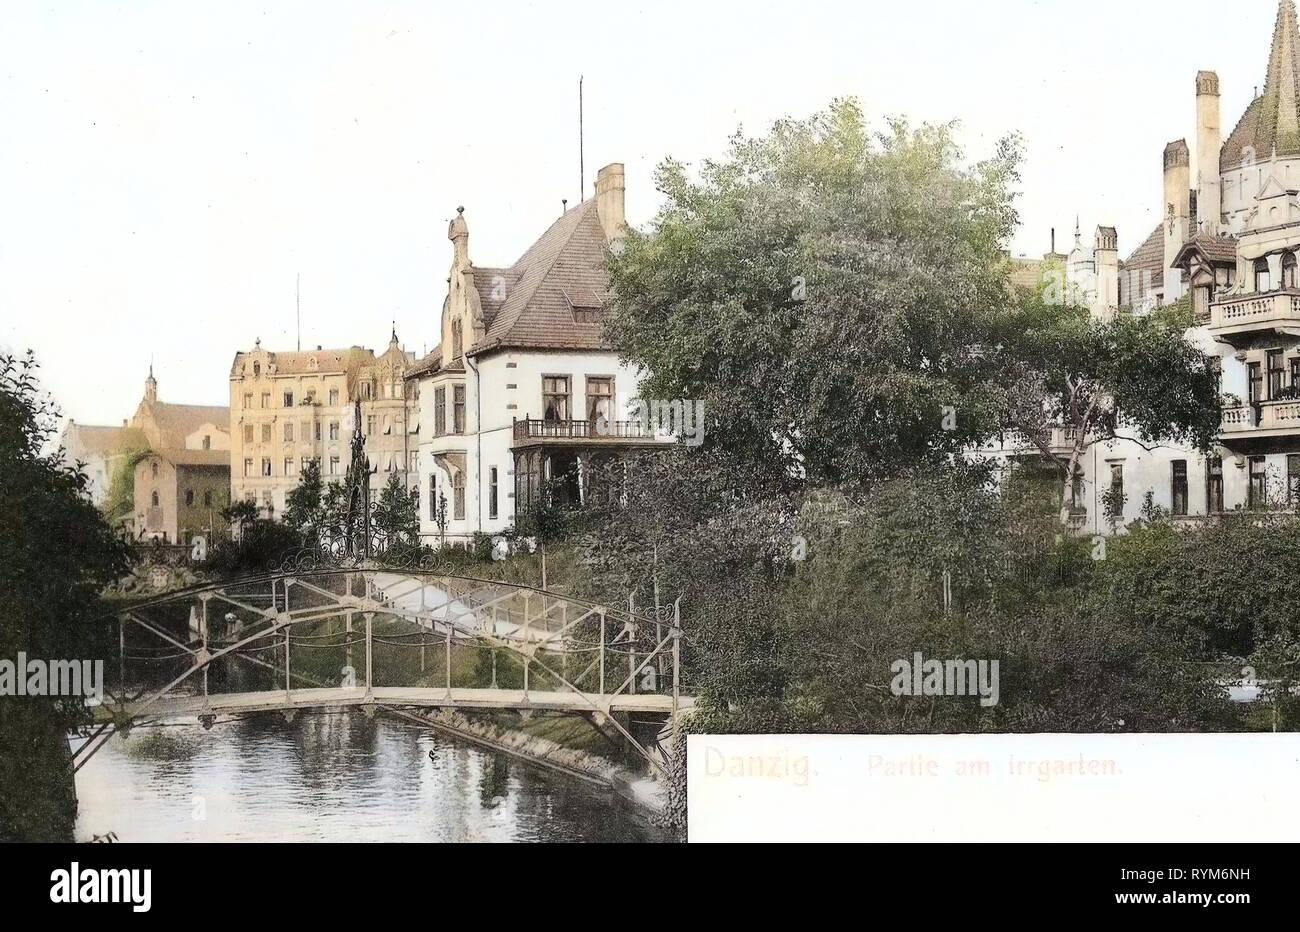 Hedge mazes in Poland, Bridges in Gdańsk, 1903, Pomeranian Voivodeship, Danzig, am Irrgarten - Stock Image